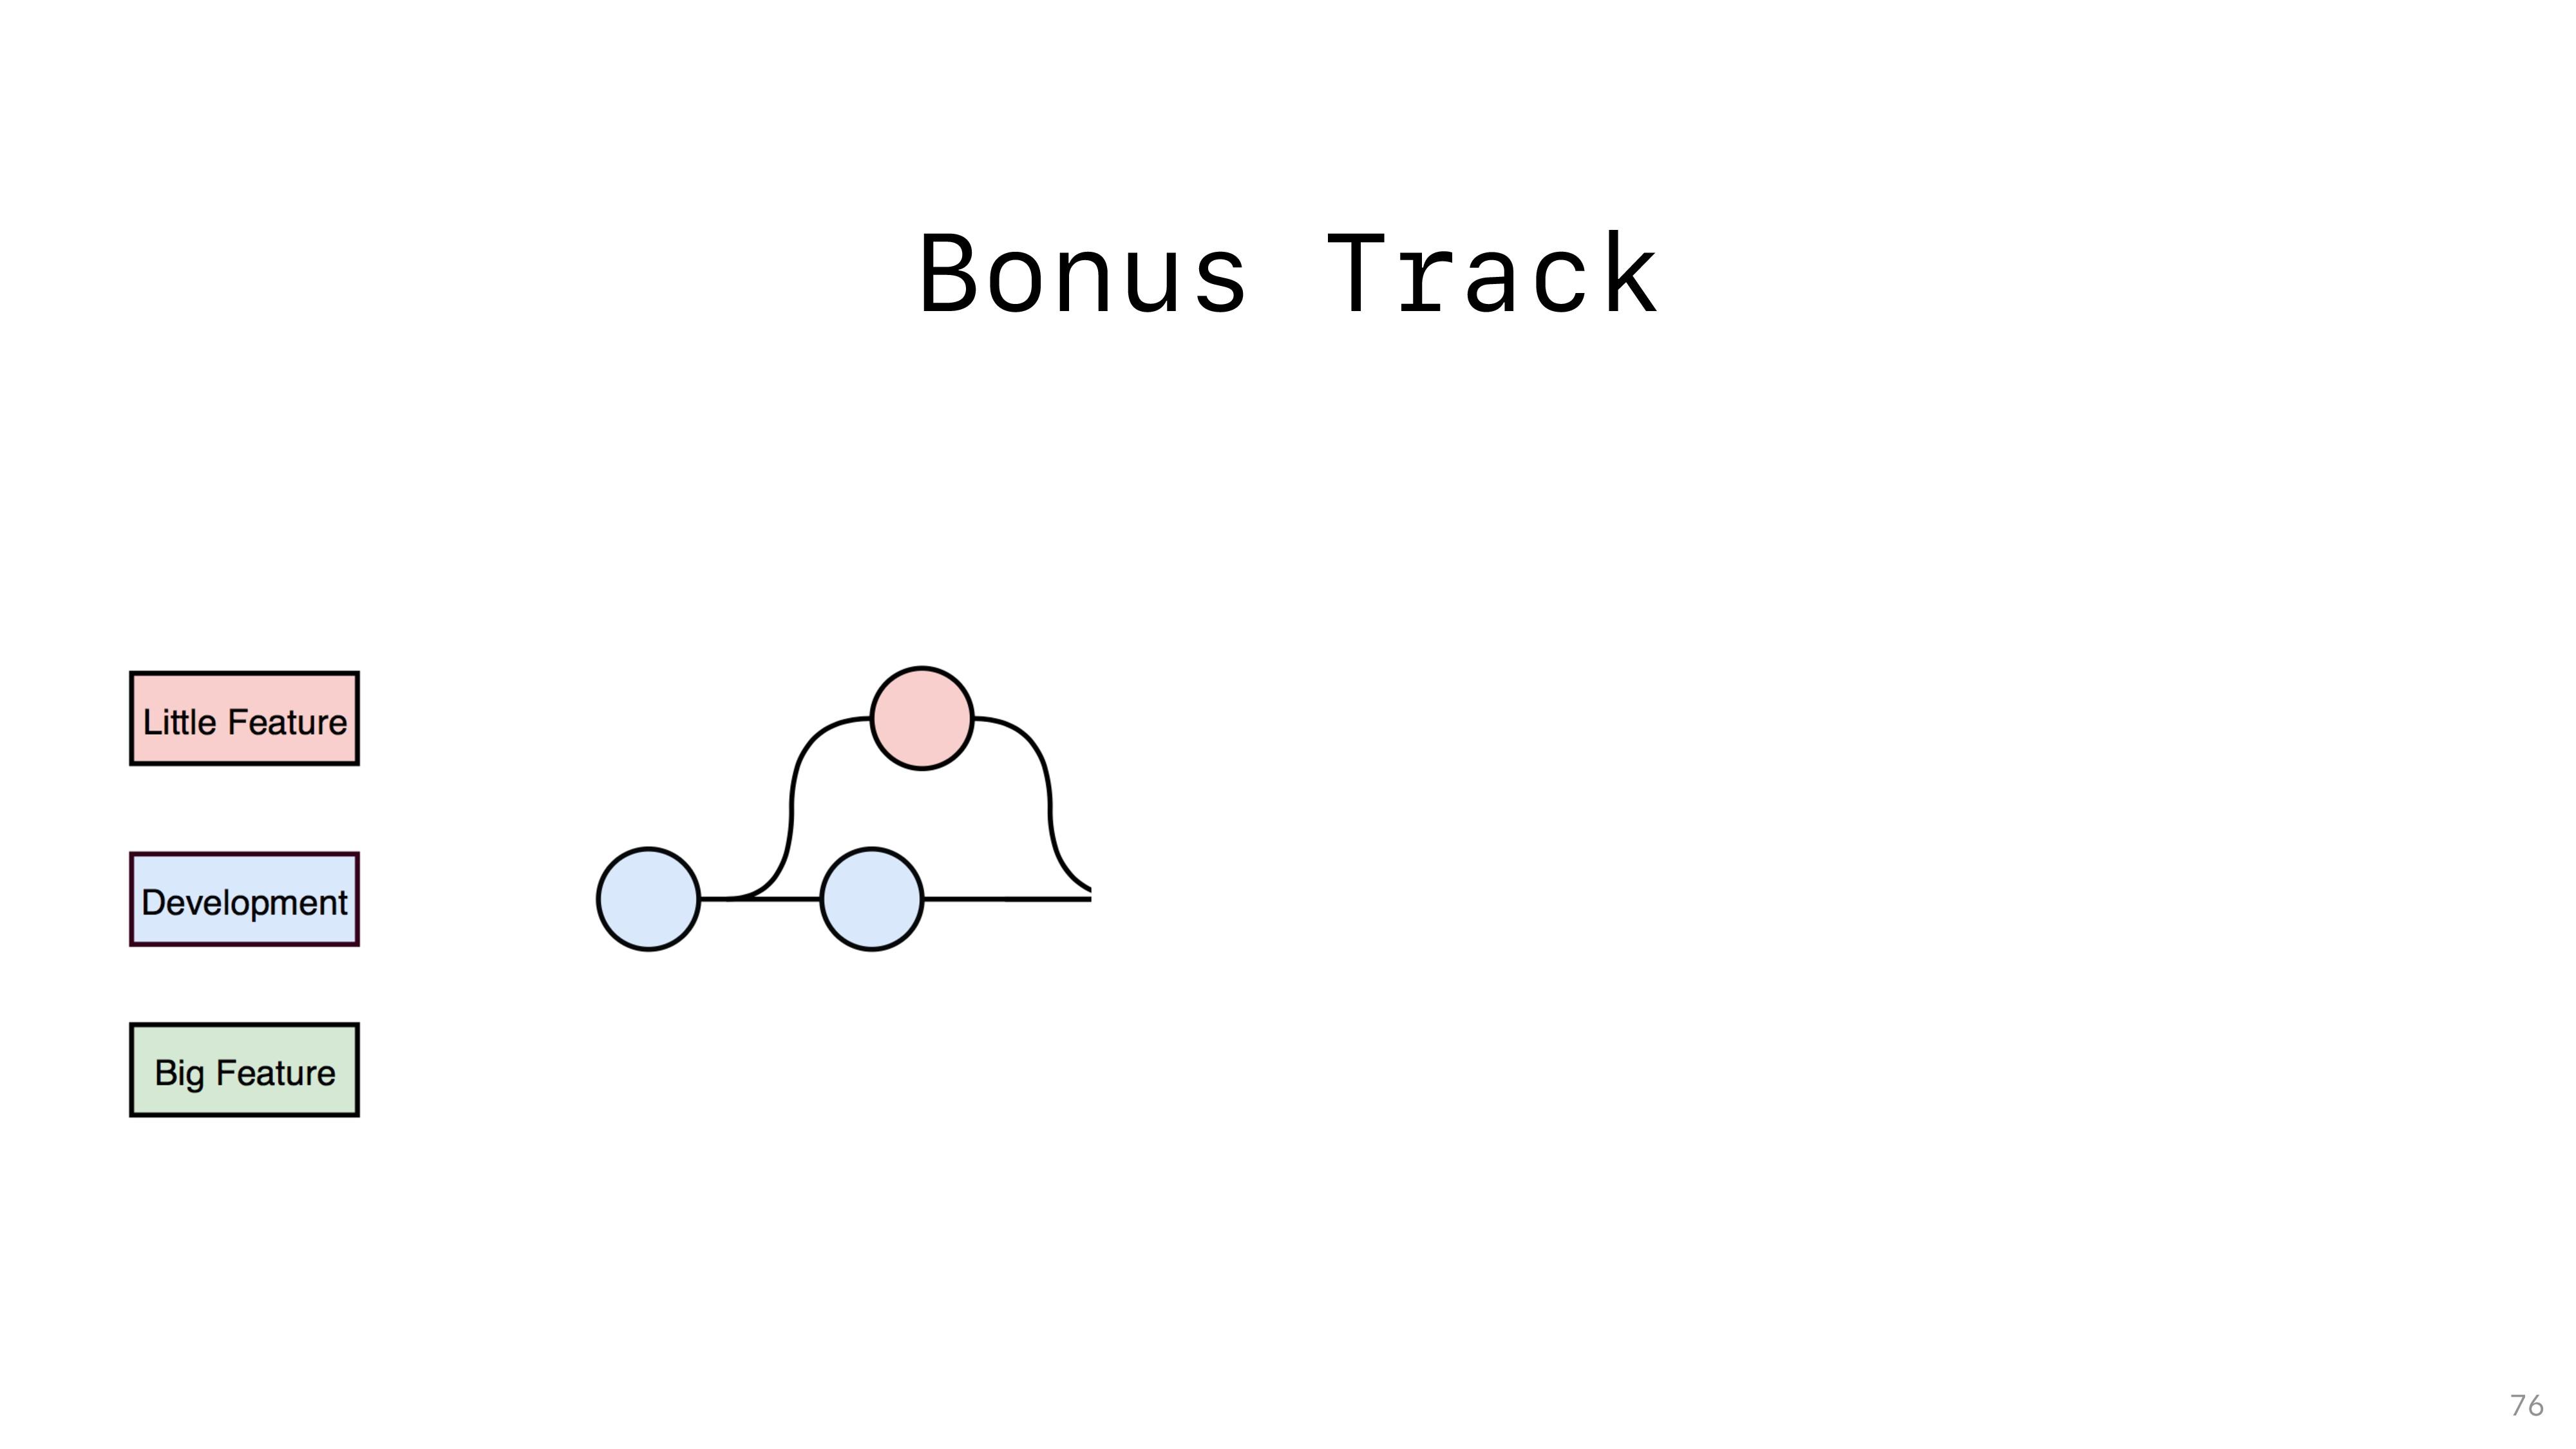 Bonus Track 76